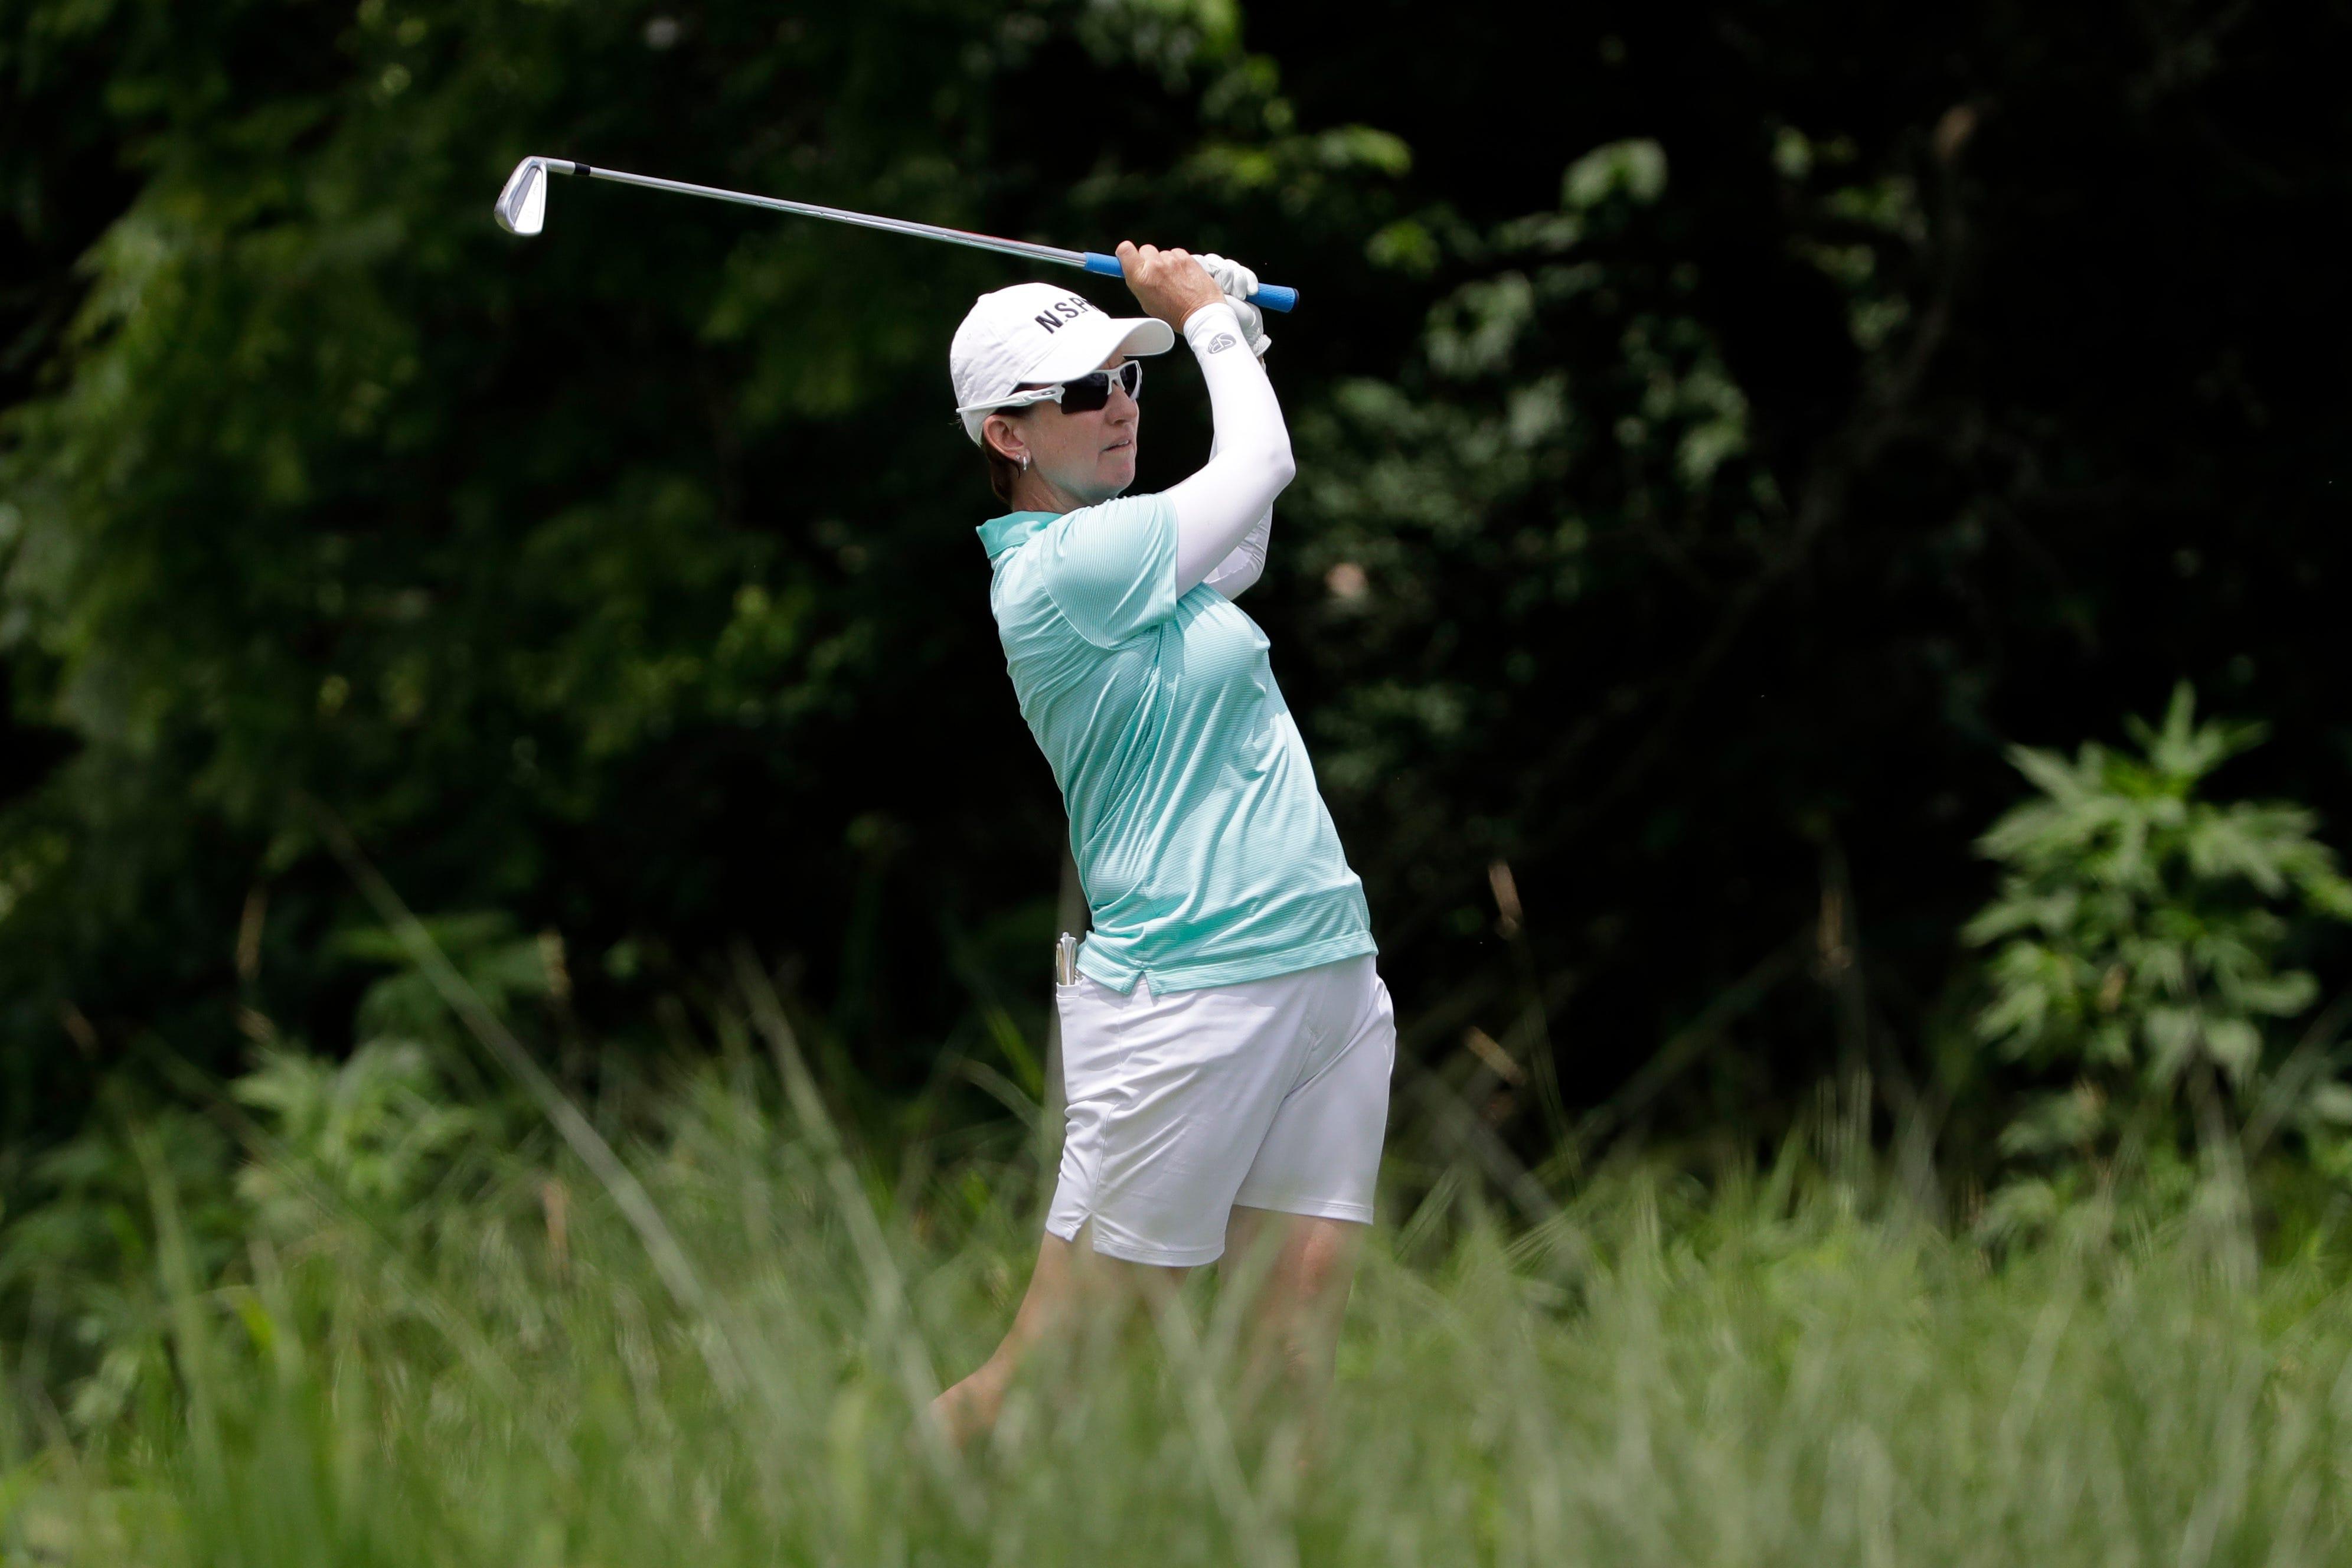 Nelly Korda has 3-shot lead into Australian Open's 4th round